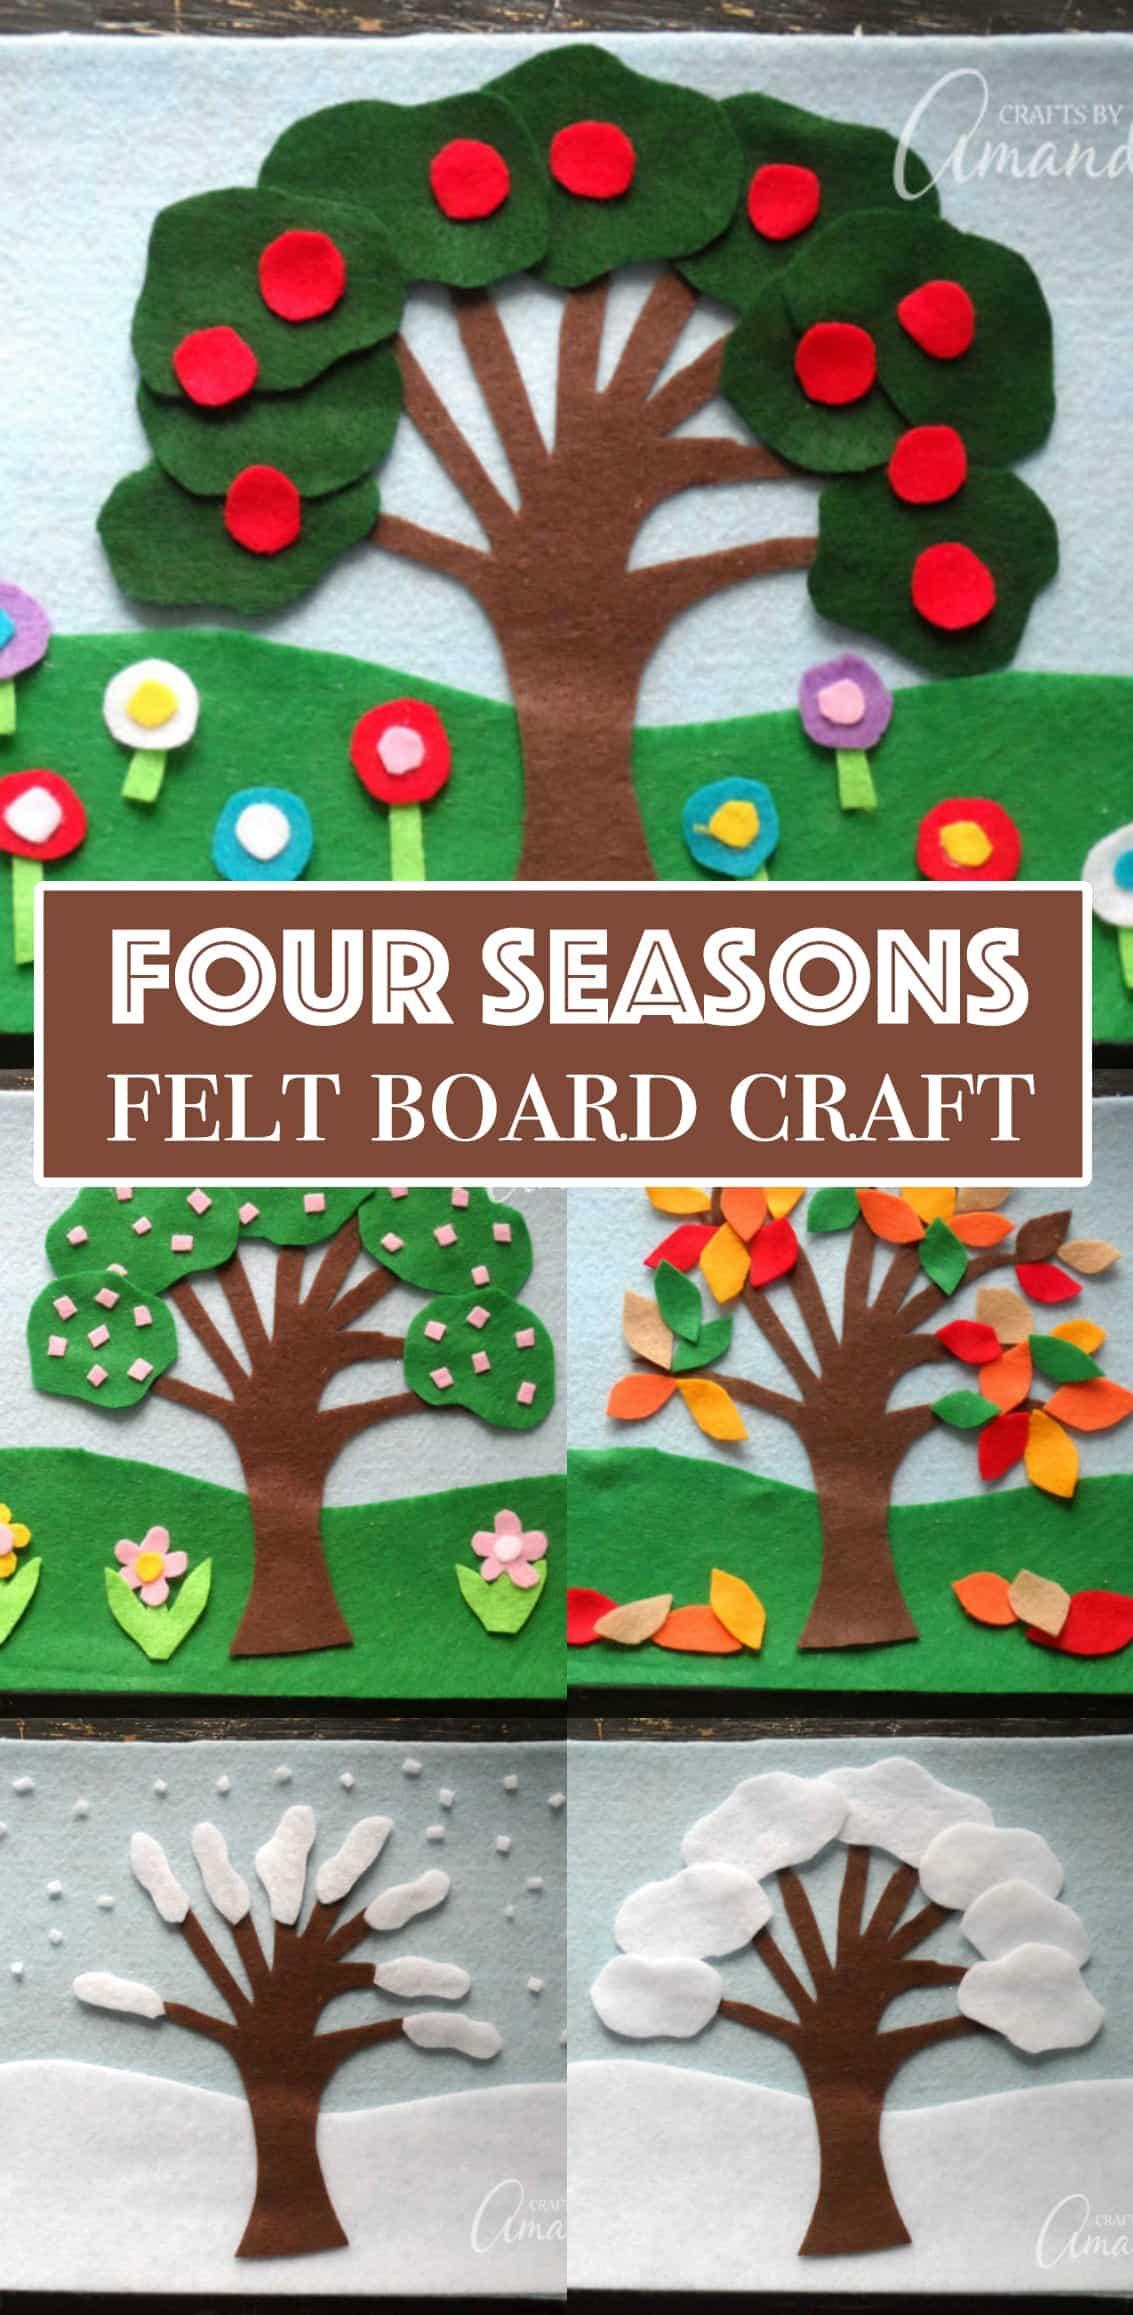 Felt Board Craft 4 Seasons Felt Board Craft Great For Kids